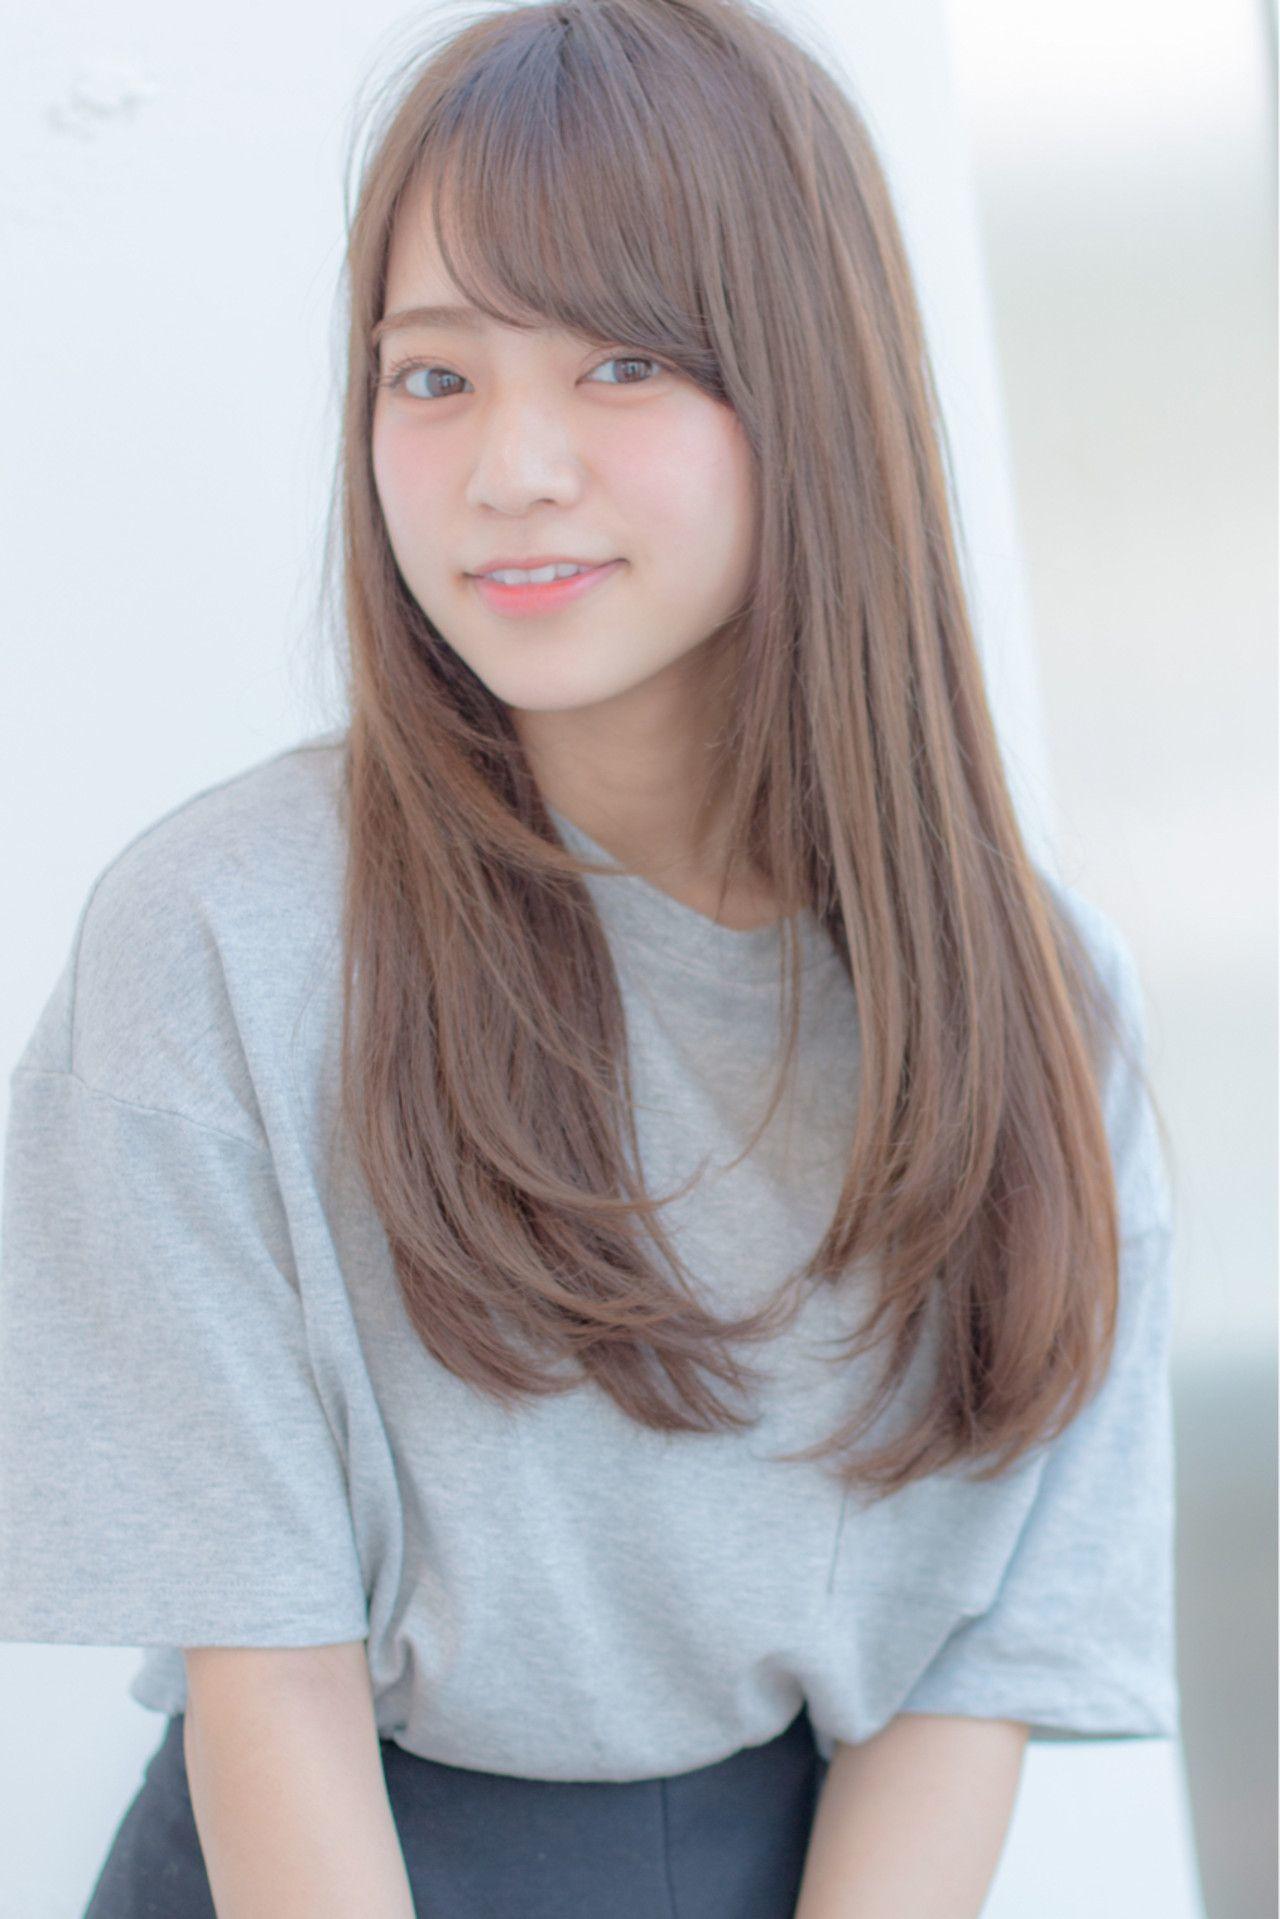 Image Result For エアリーレイヤーストレートヘア Long Hair Styles Hair Styles Hair